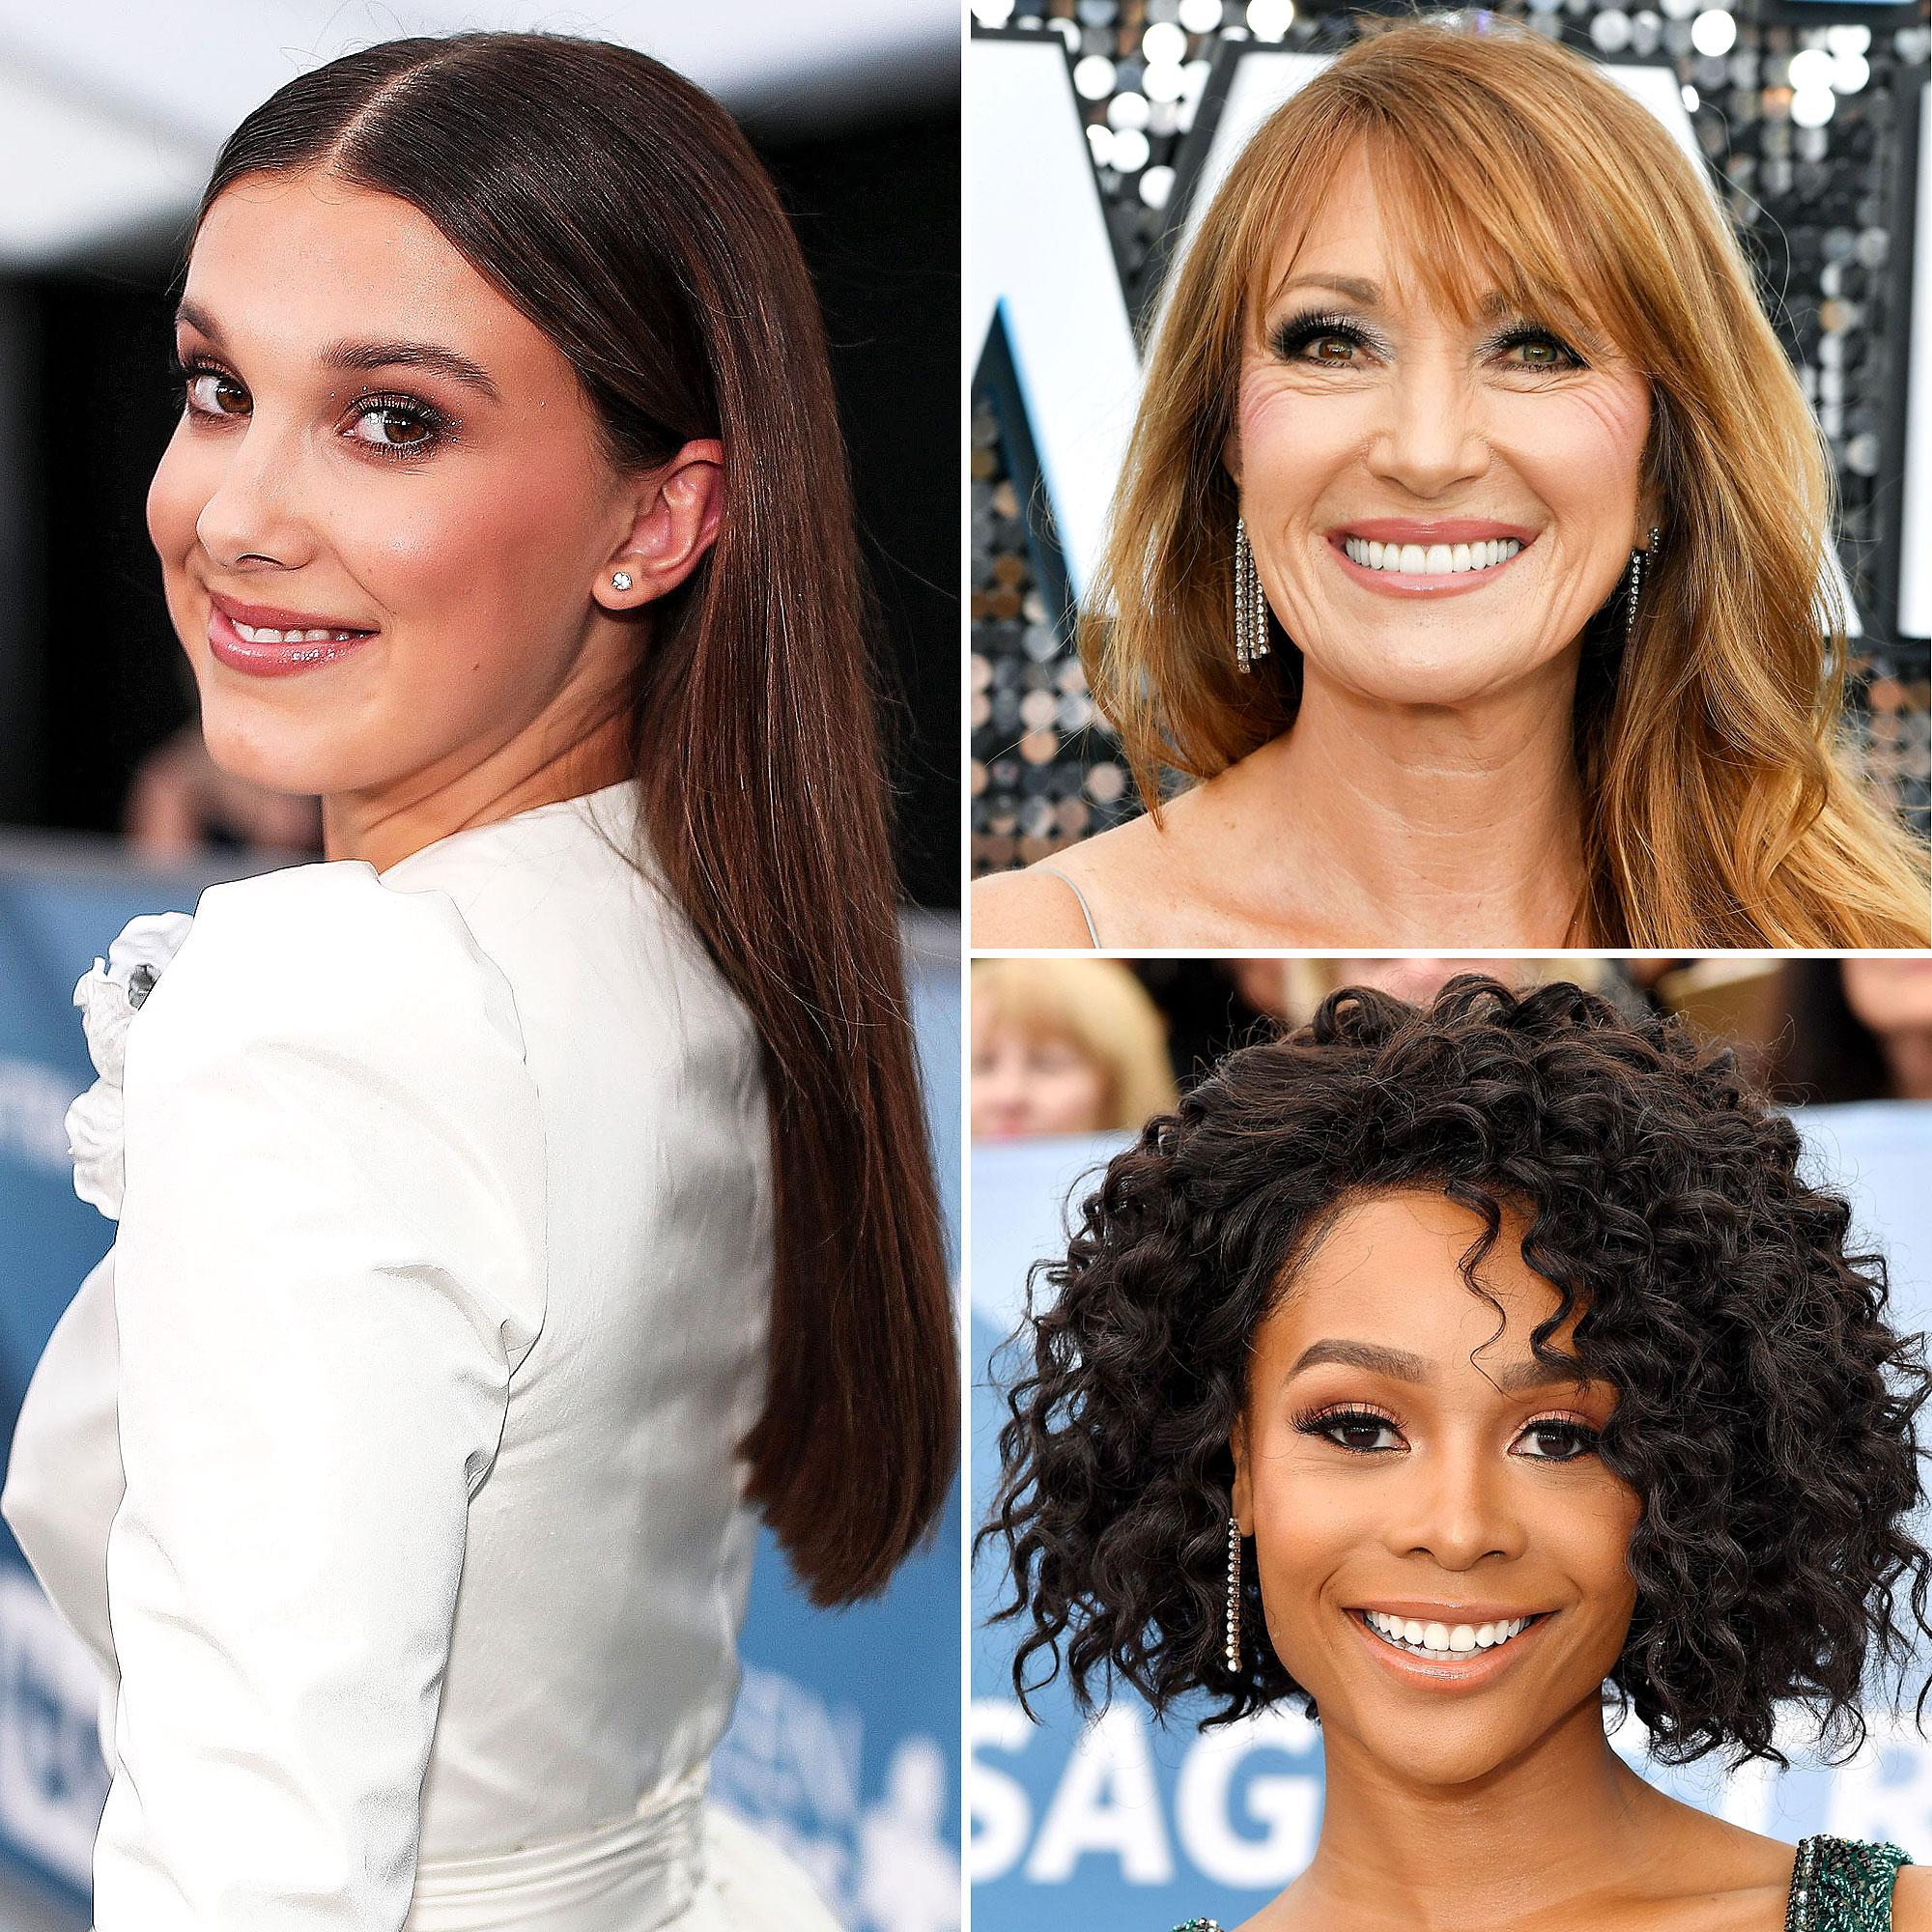 Sag Awards 2020 Best Beauty Hair Makeup Looks